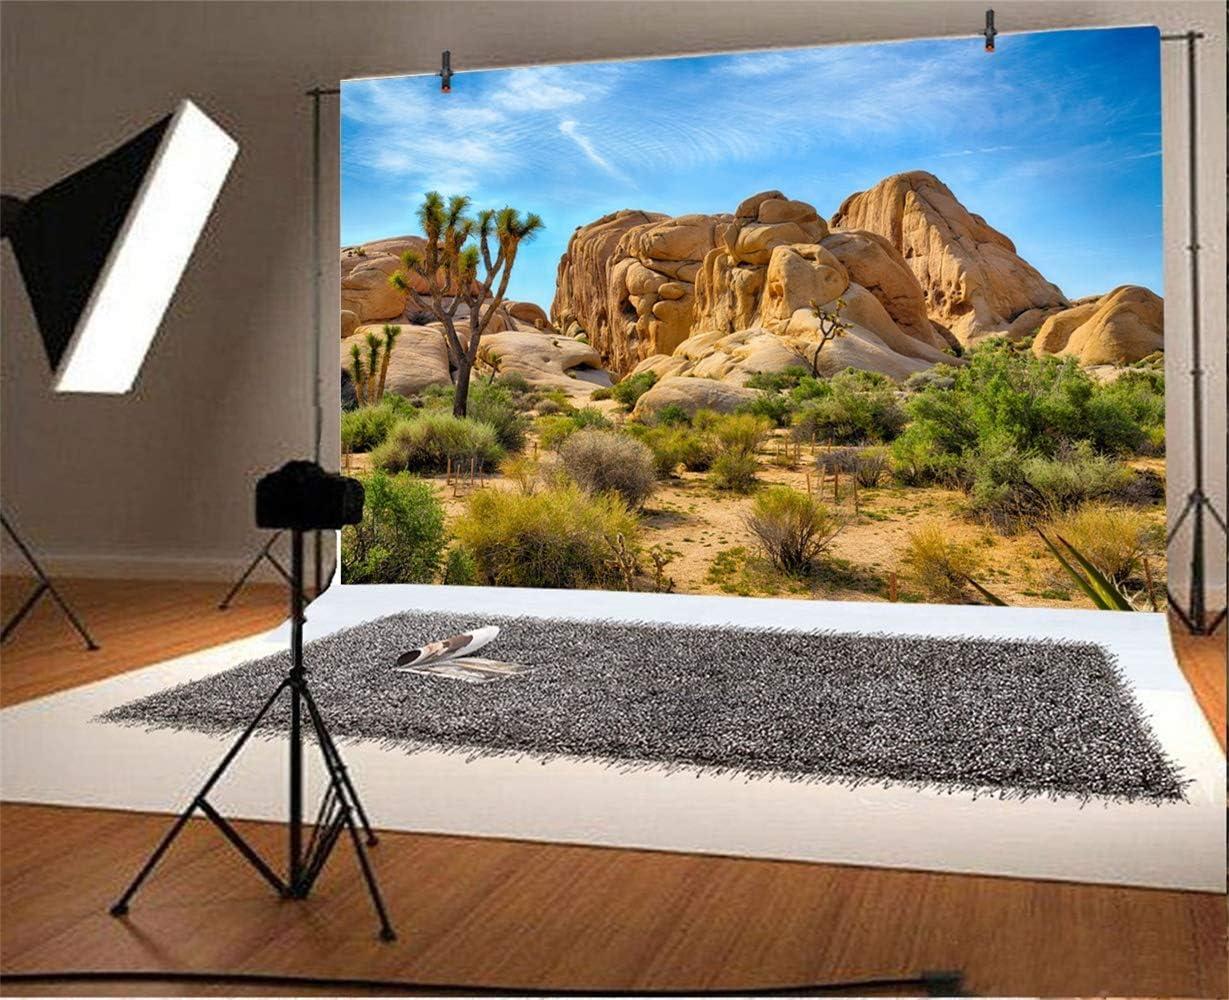 GoEoo 10x7ft Joshua Tree National Park Scenic Vinyl Photography Background Arid Desert Plants Cactus Boulder Sandstone Backdrop Southwestern Scenery Wallpaper Studio